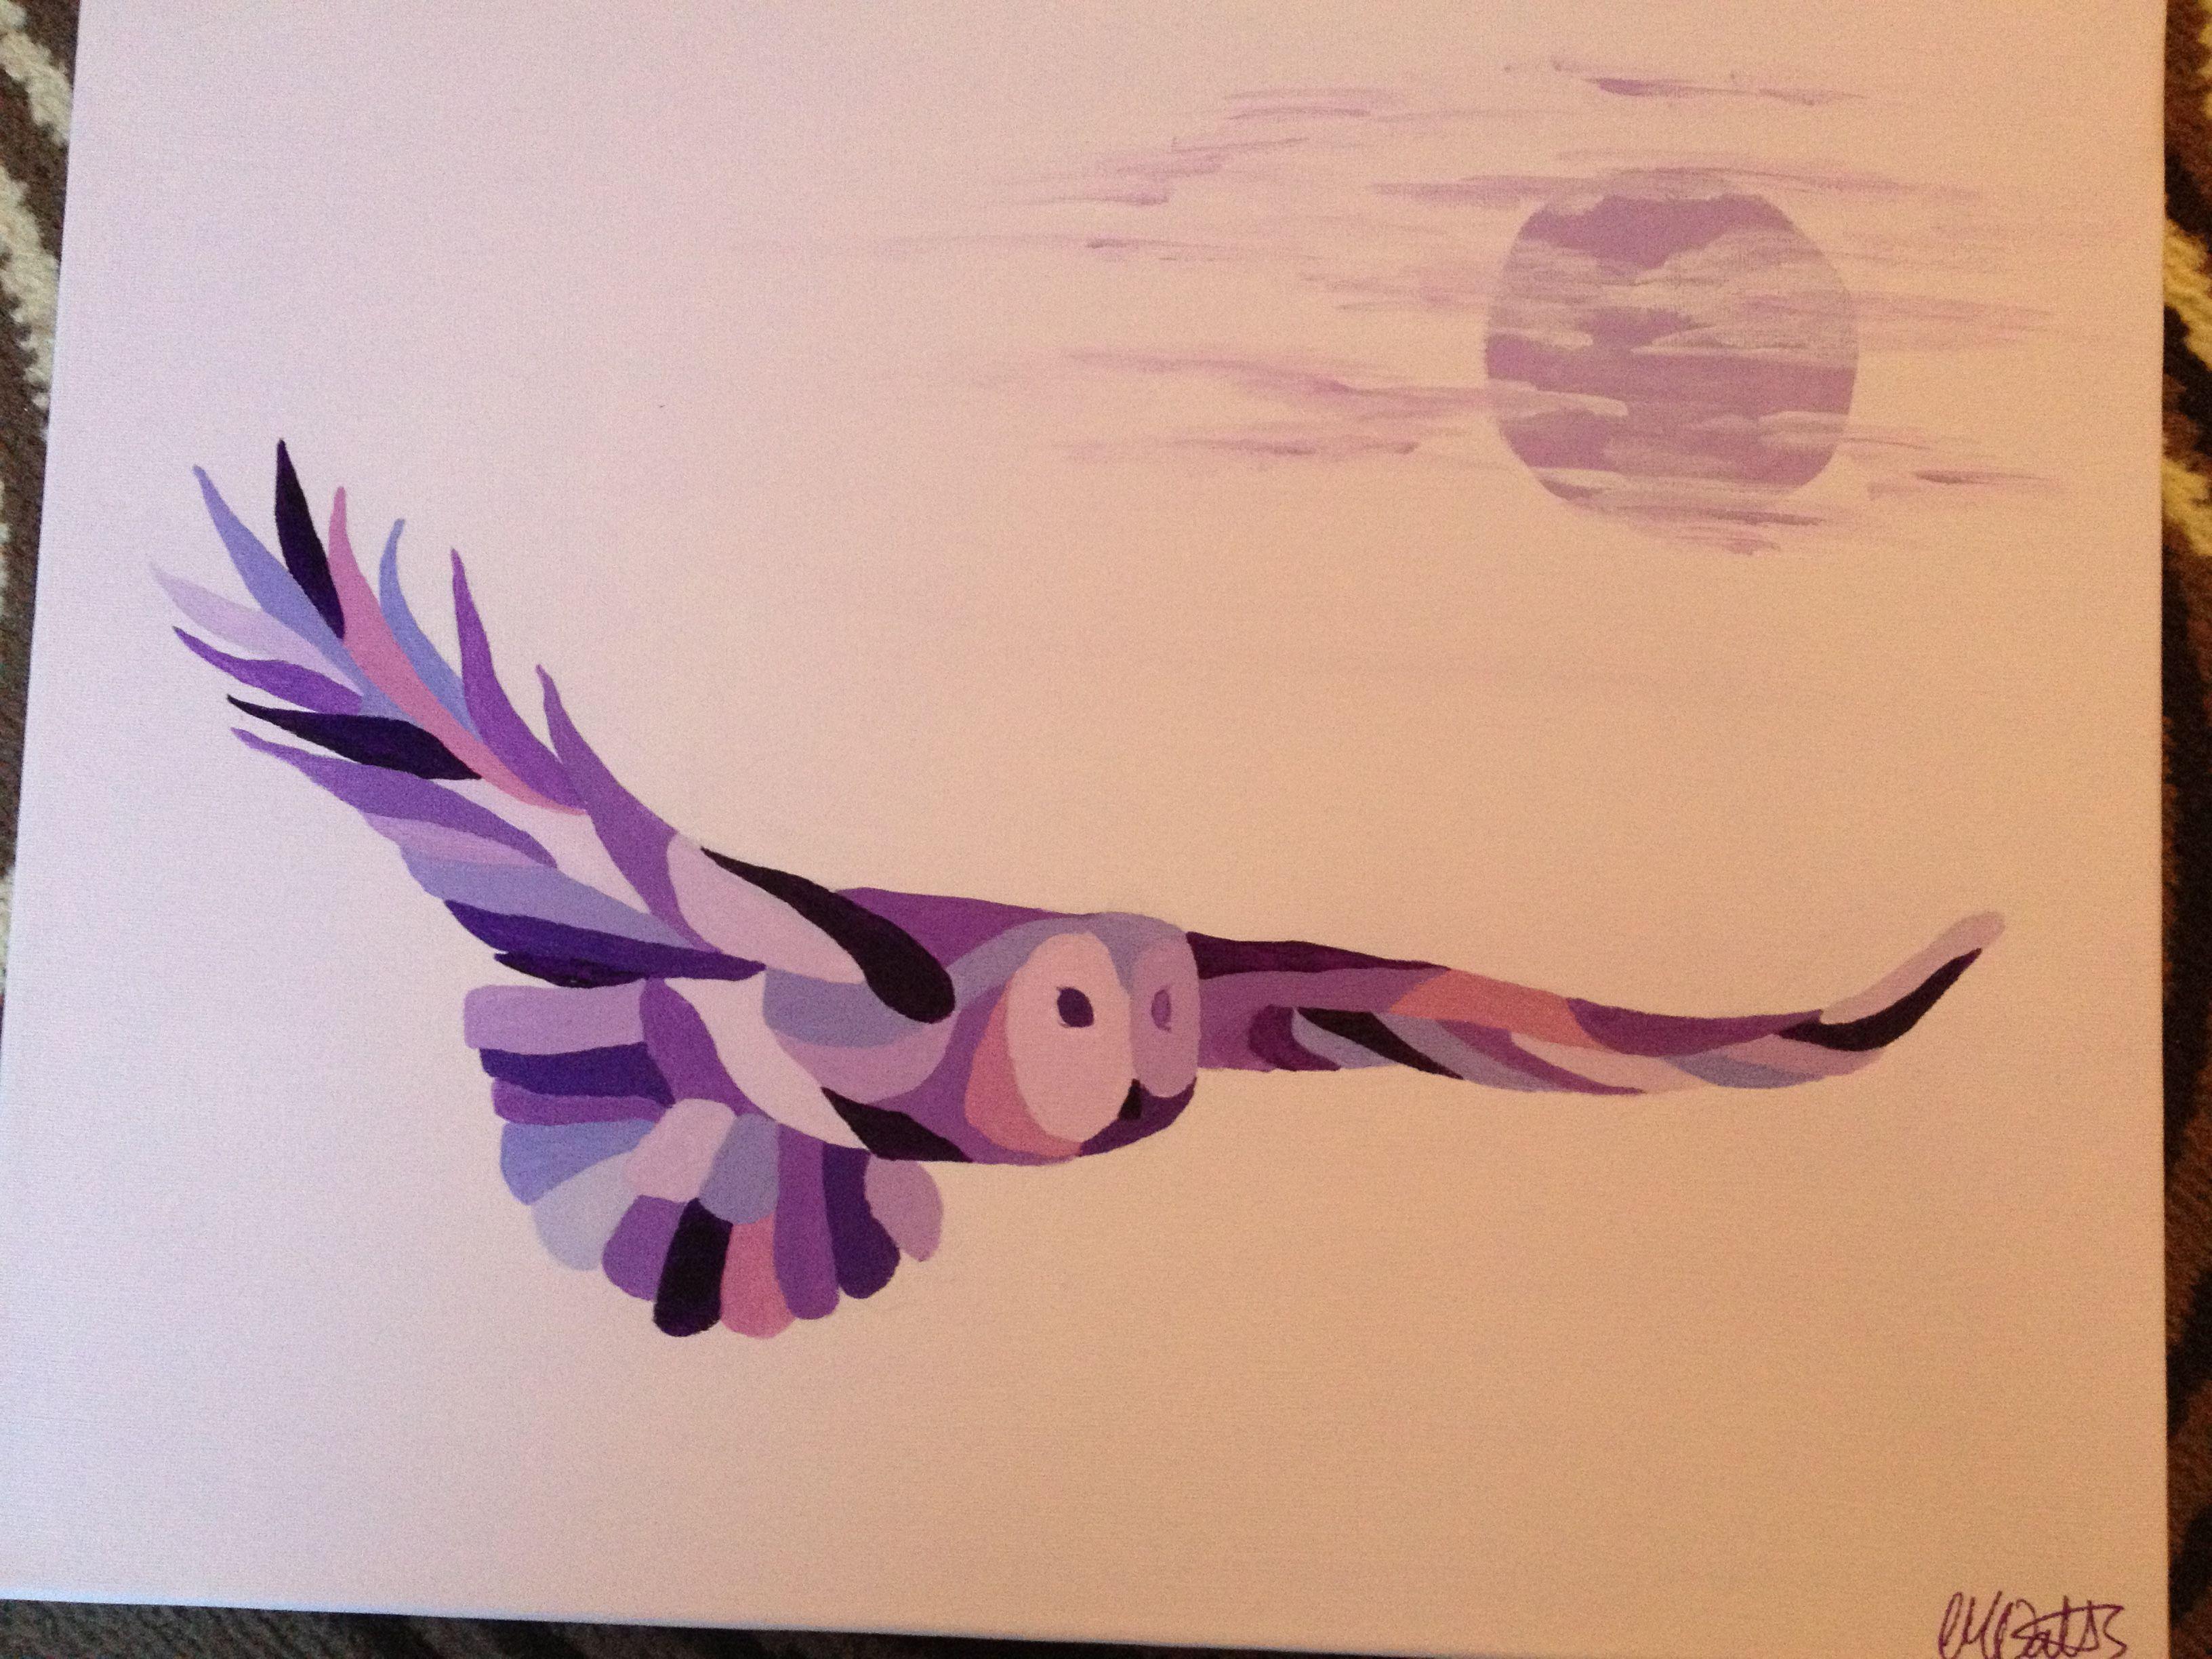 Twilight Hunter - acrylics on canvas